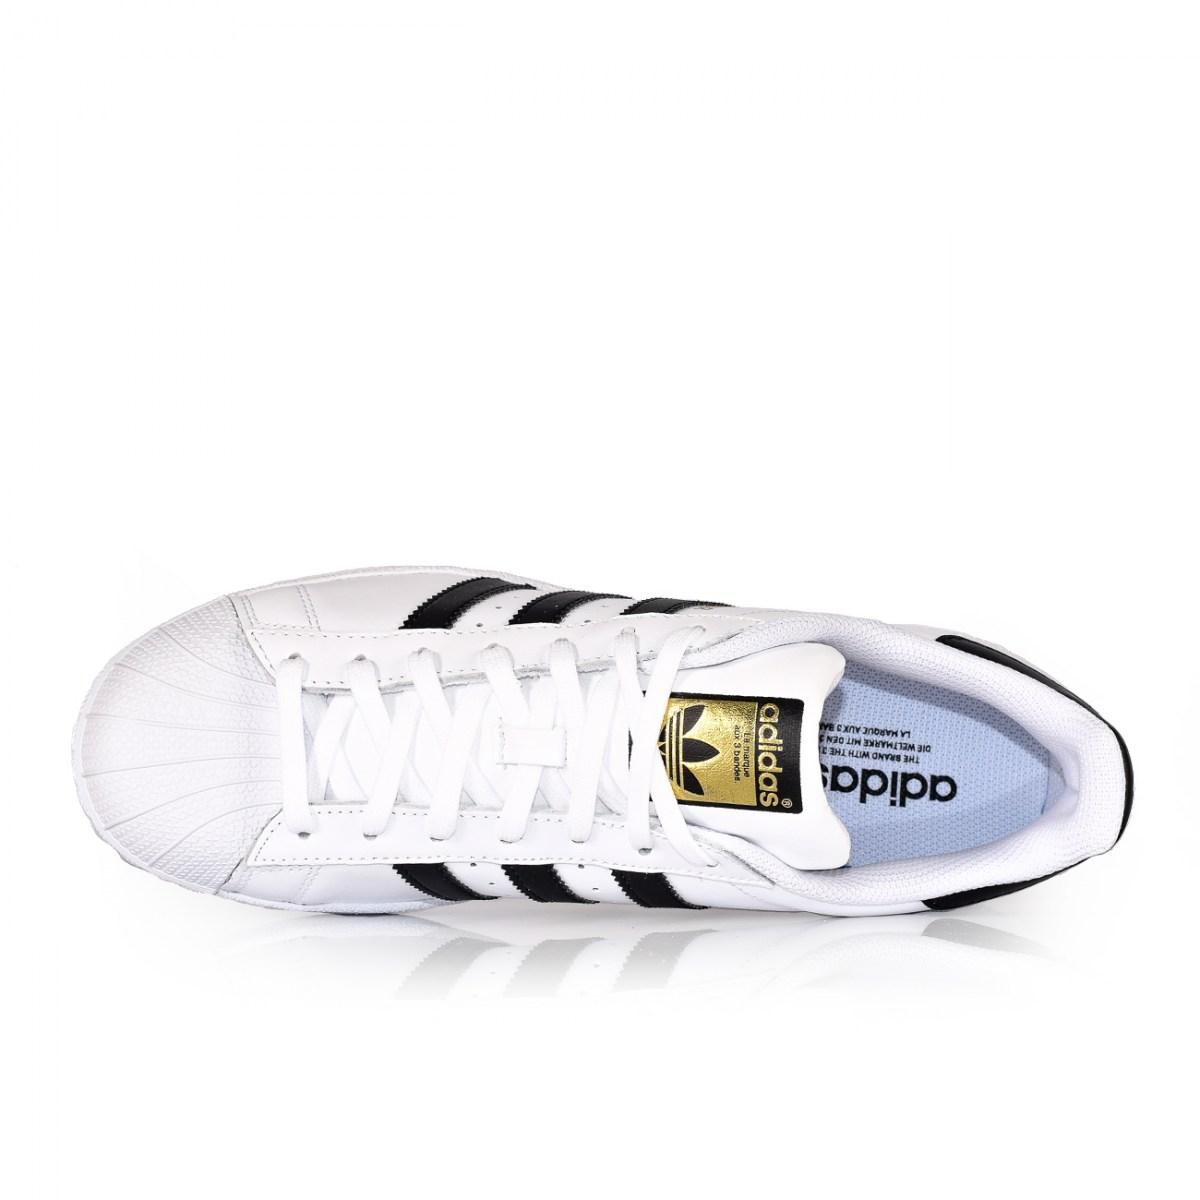 best sneakers 01906 7d8eb ADIDAS SUPERSTAR C77124 WHITE/BLACK